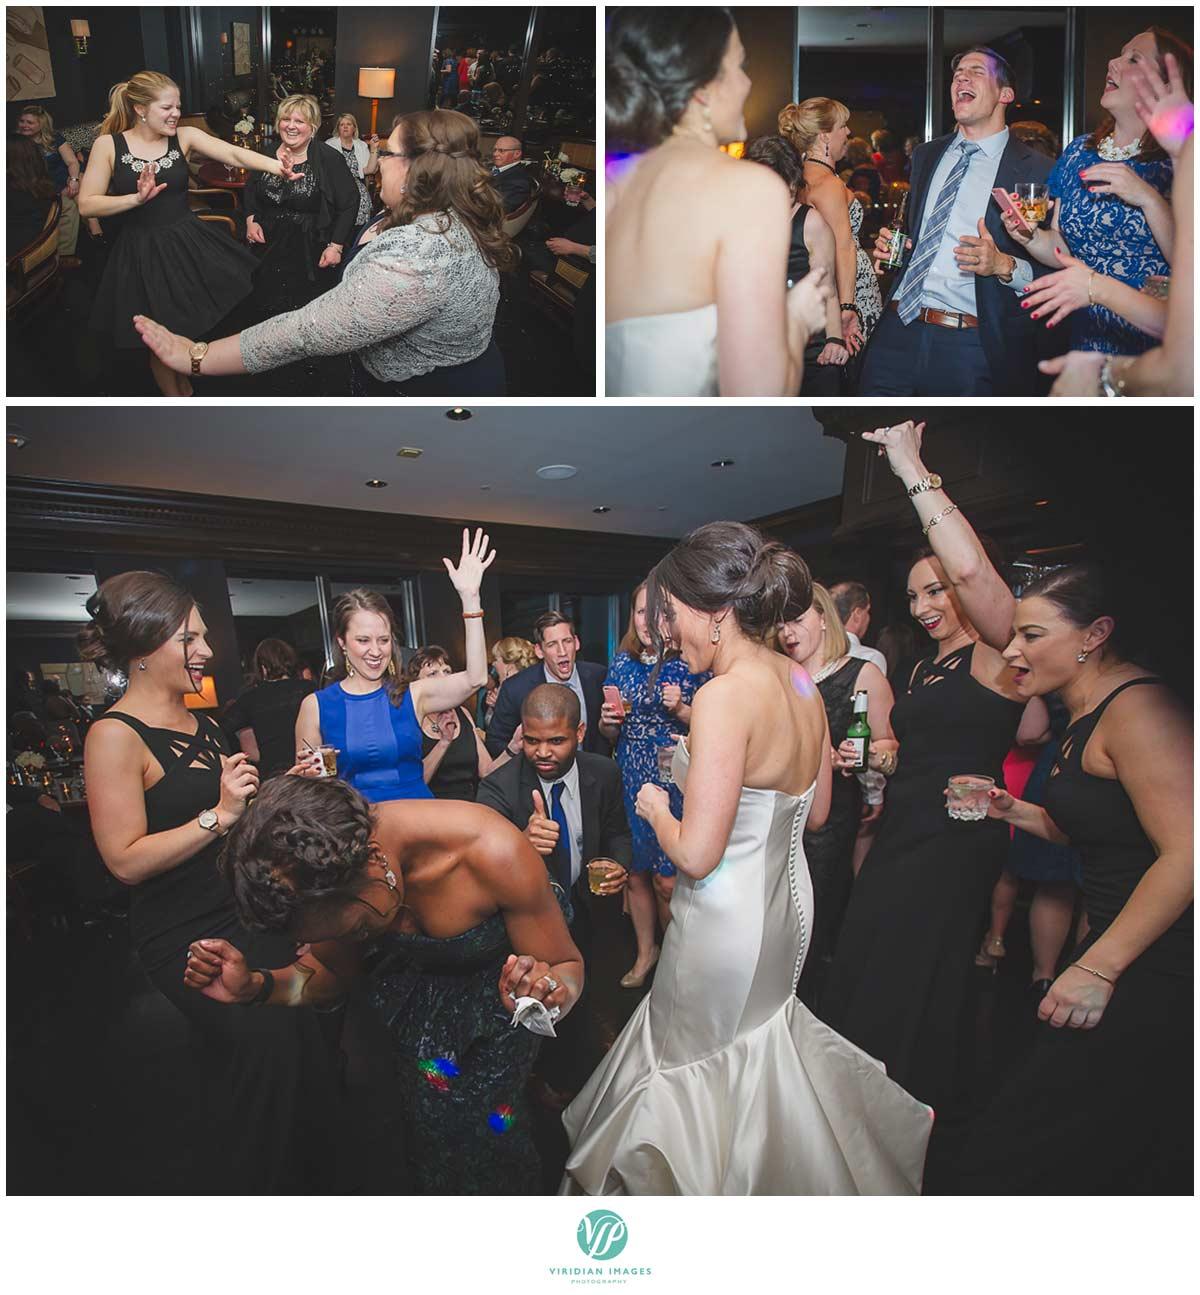 Peachtree_Club_Atlanta_Wedding_Viridian_Images_Photography-37